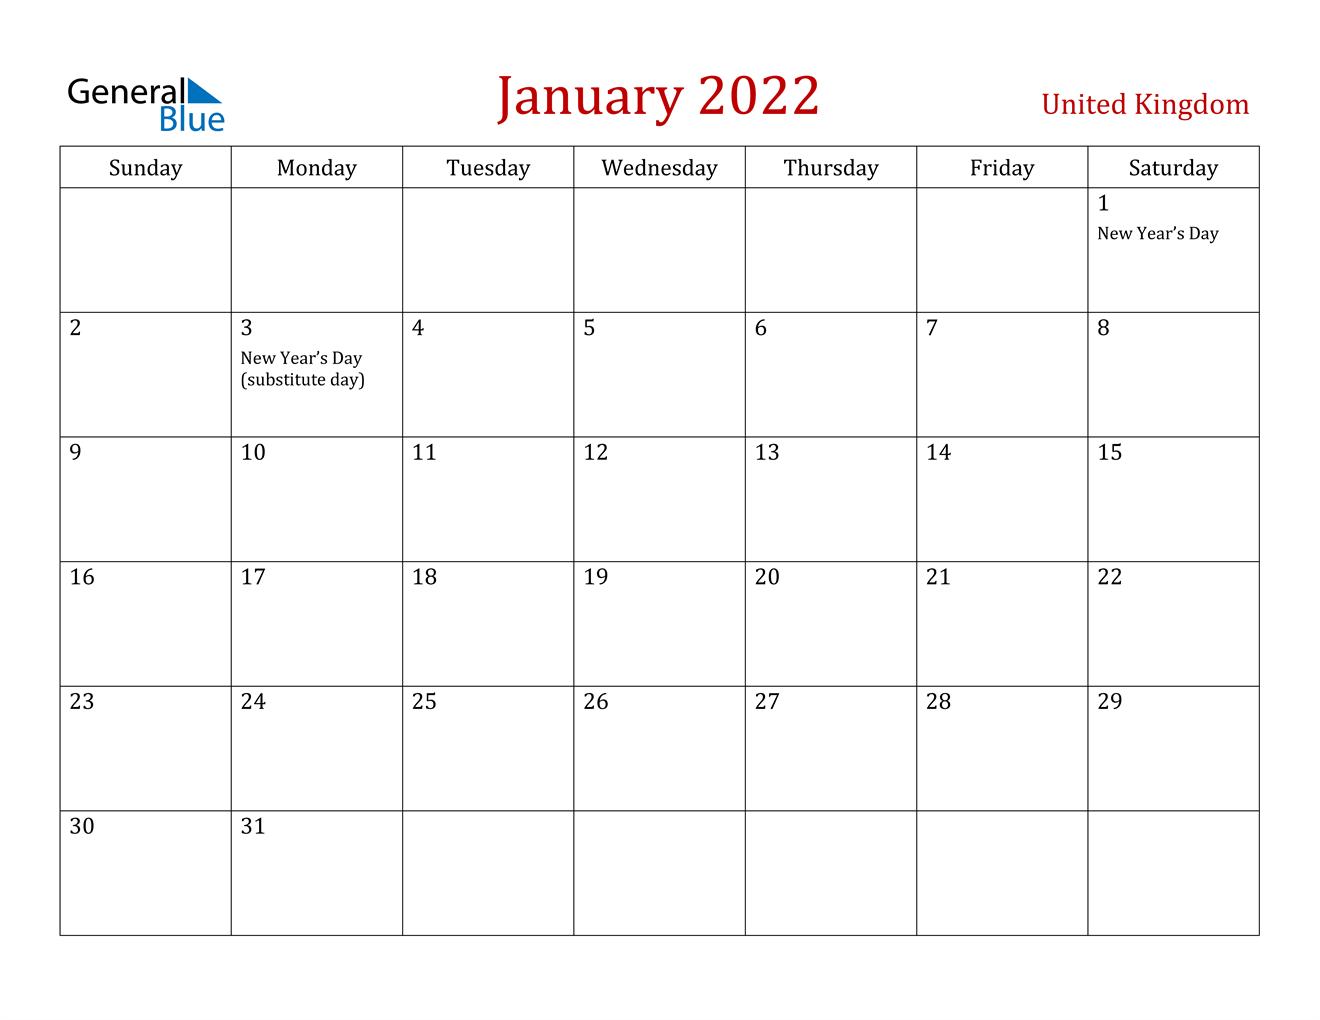 January 2022 Calendar - United Kingdom With January 2022 Printable Calendar